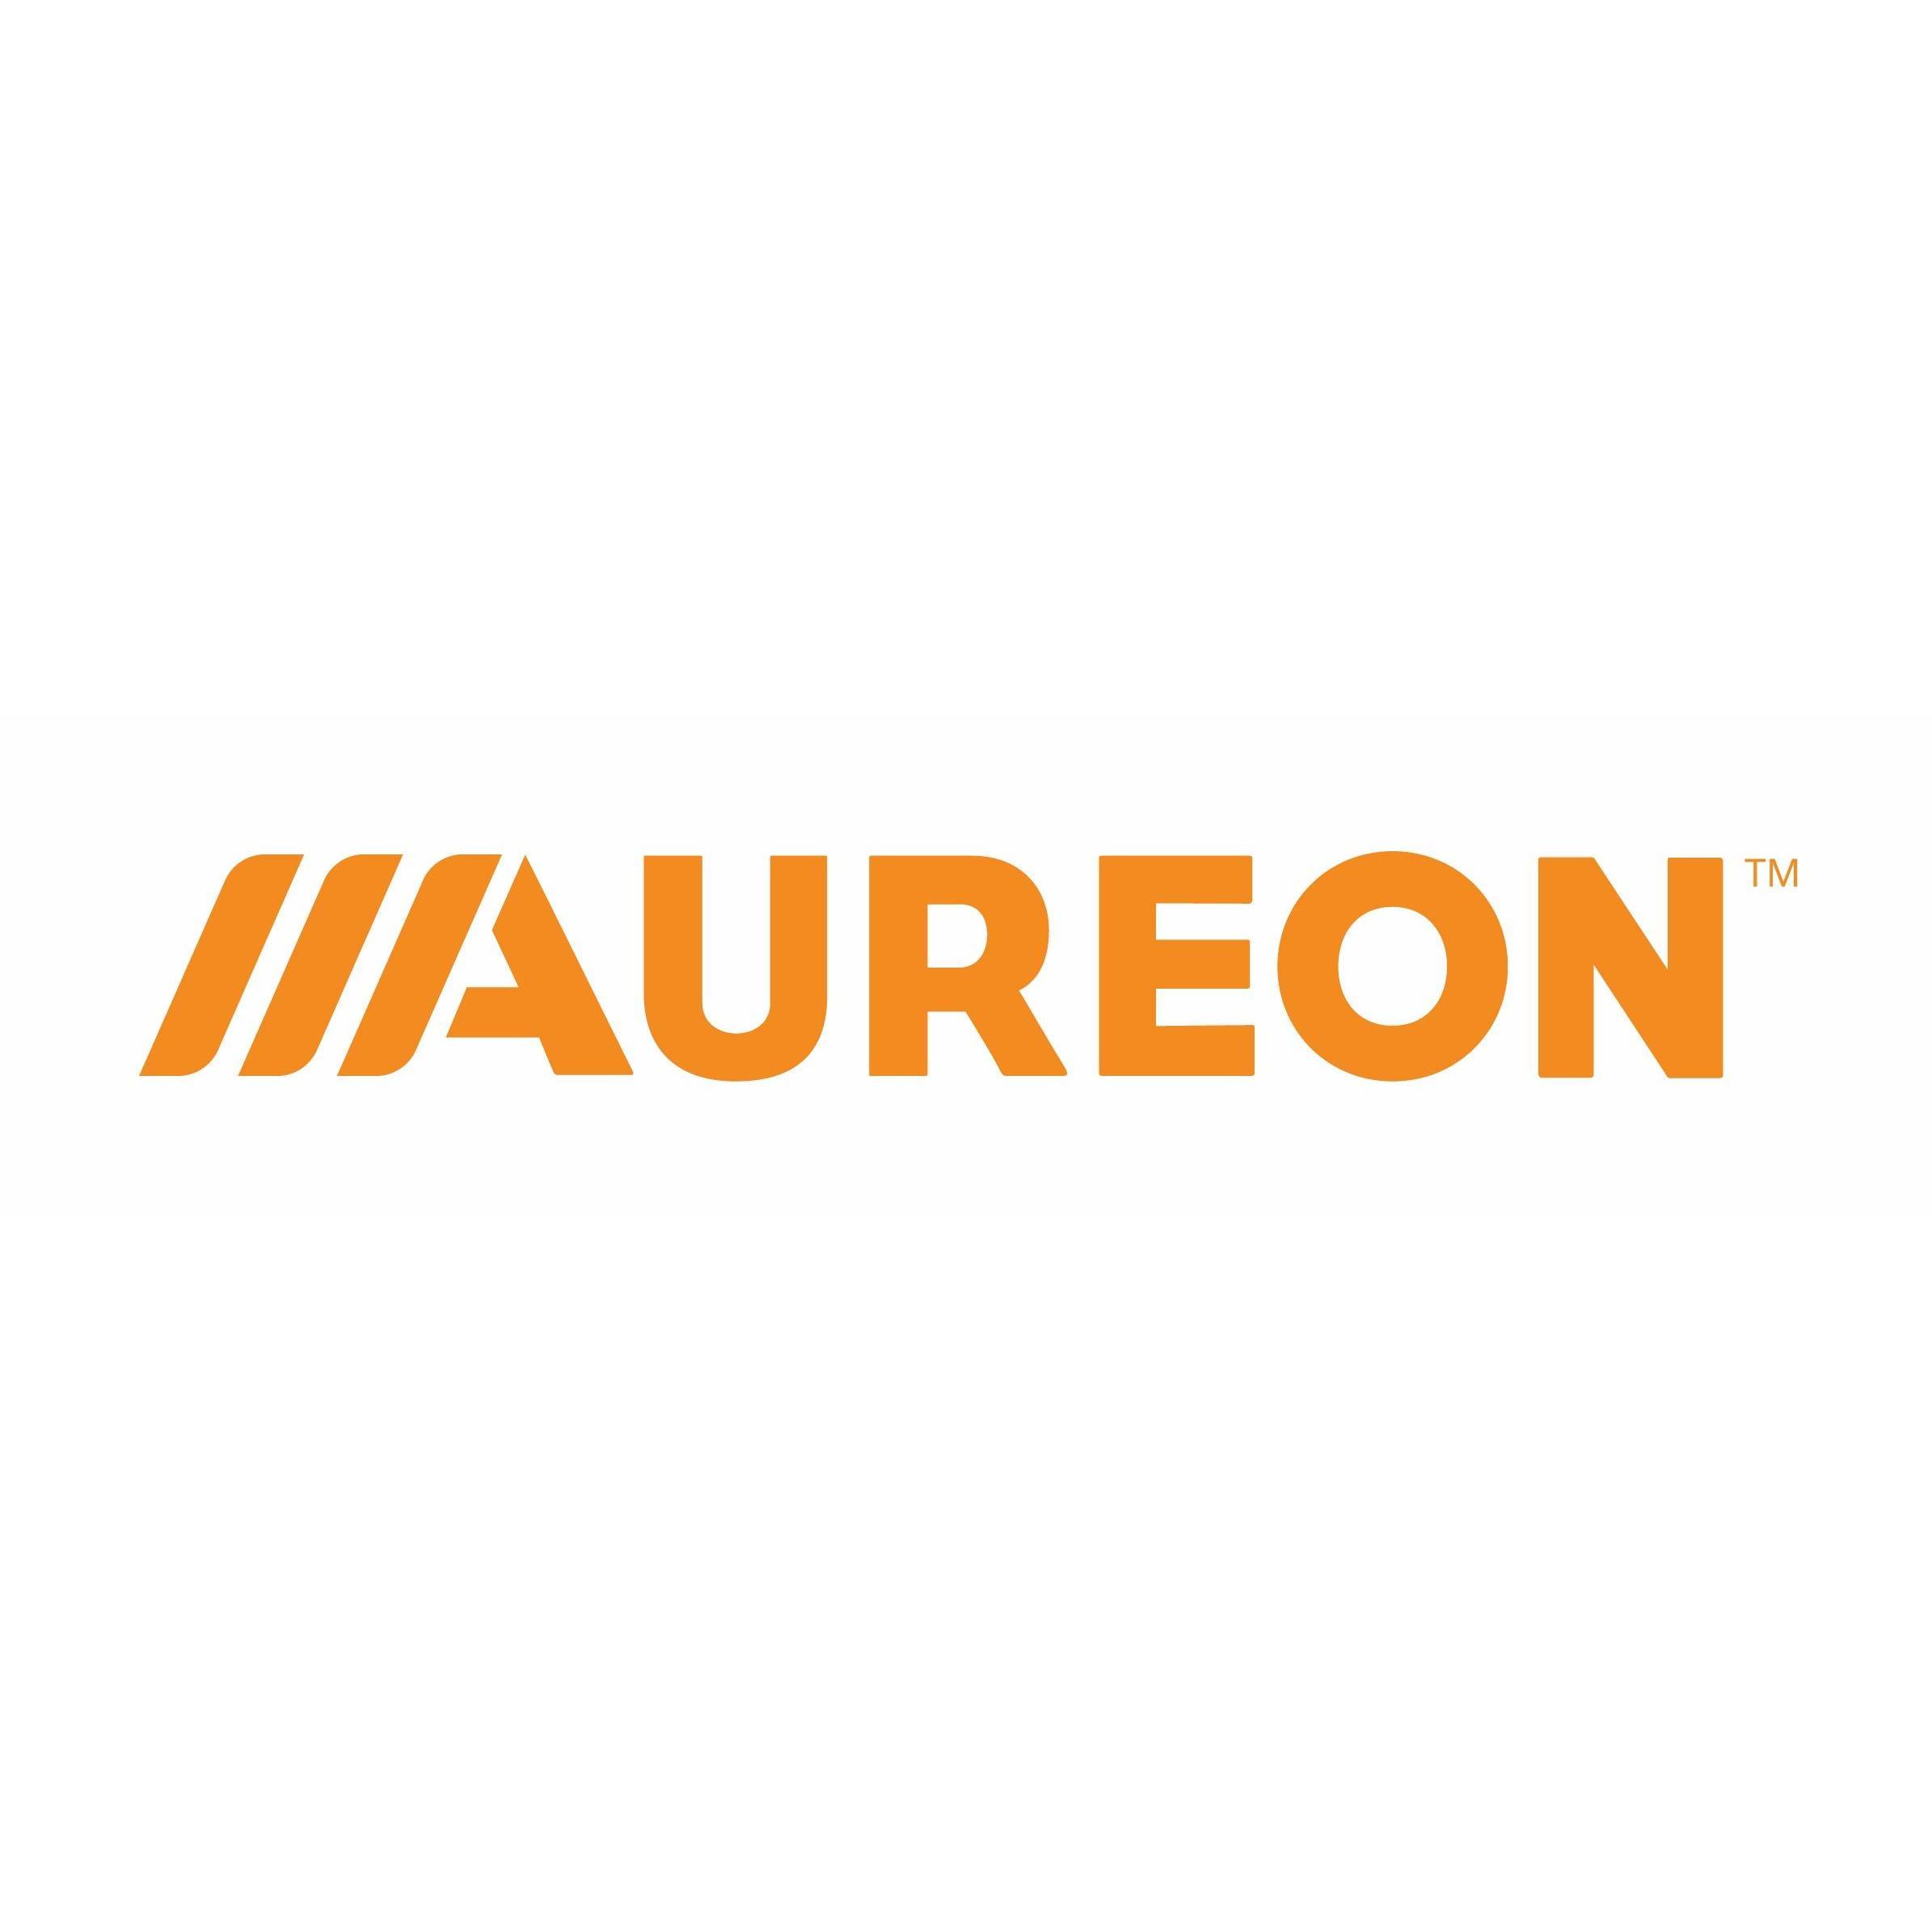 Aureon